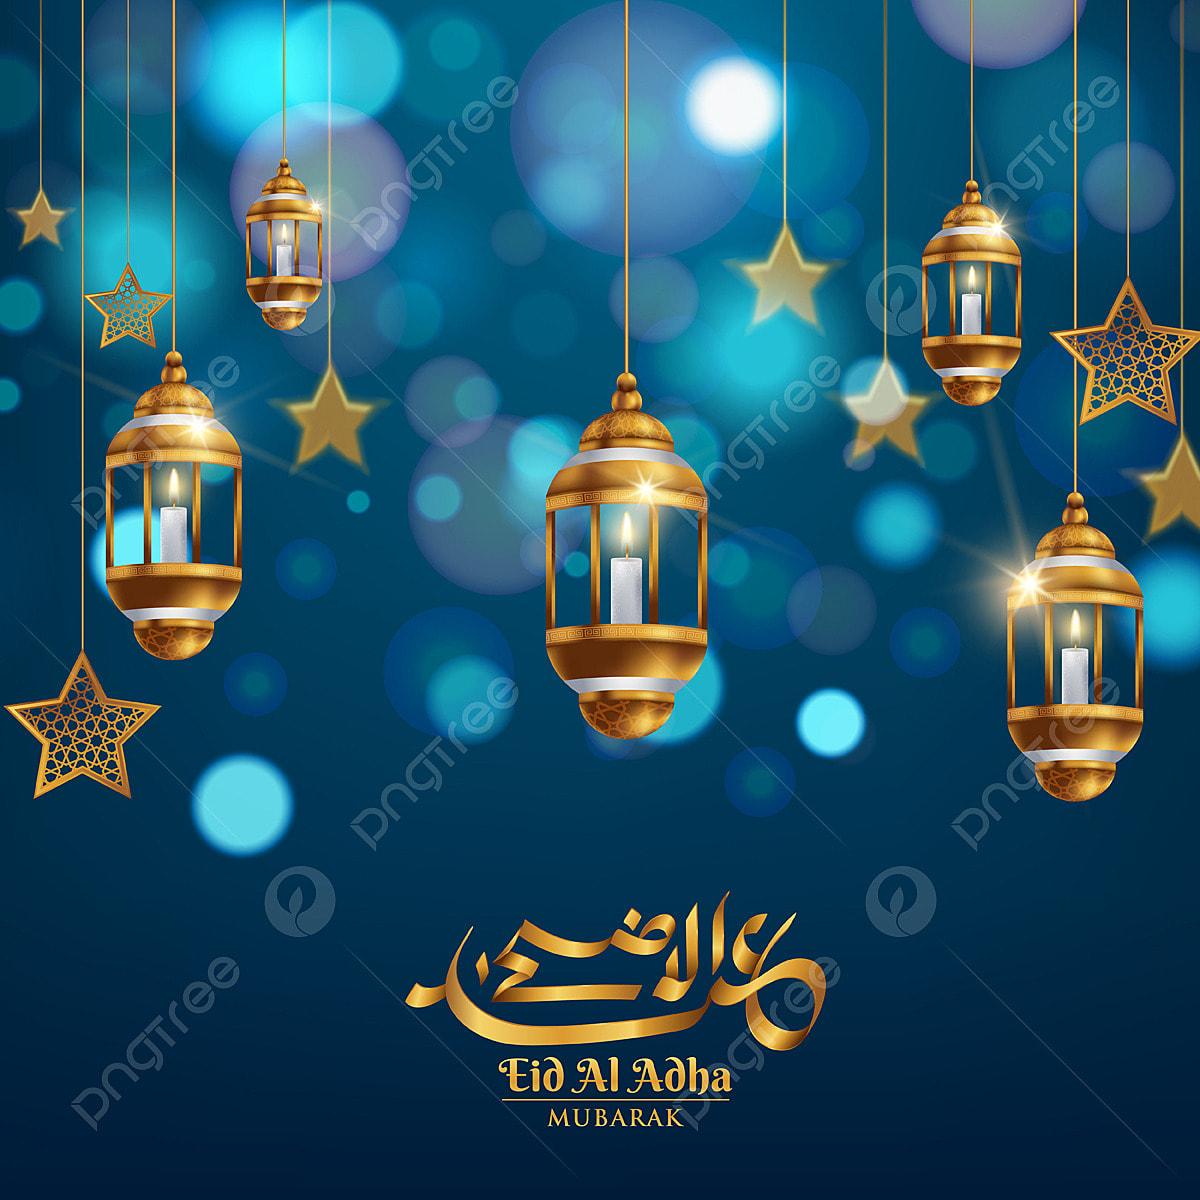 Eid Al Adha Cover Mubarak Background Template Design